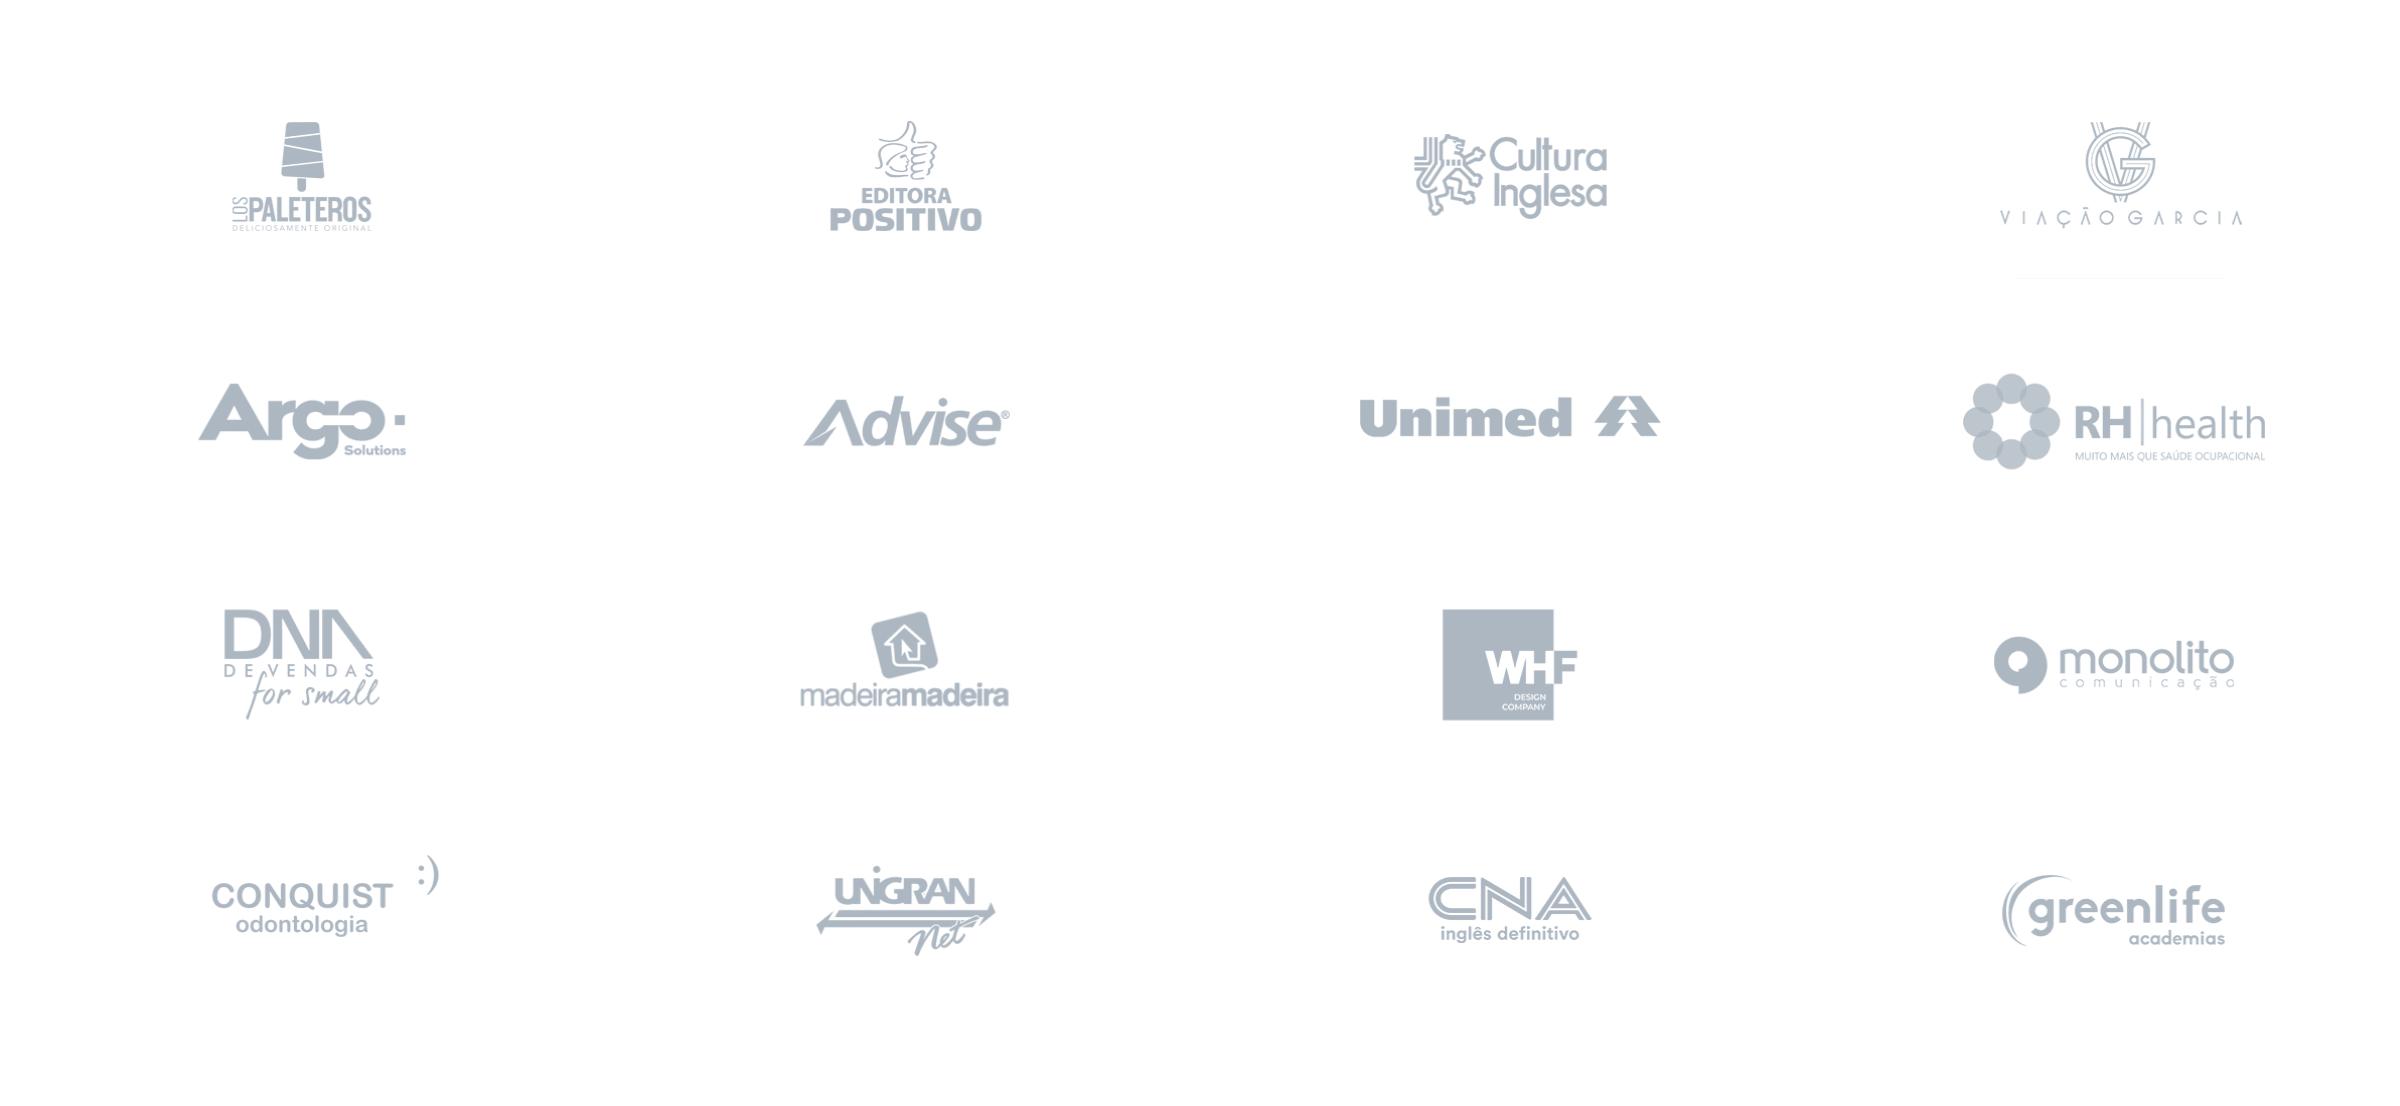 Empresas parceiras do moskit